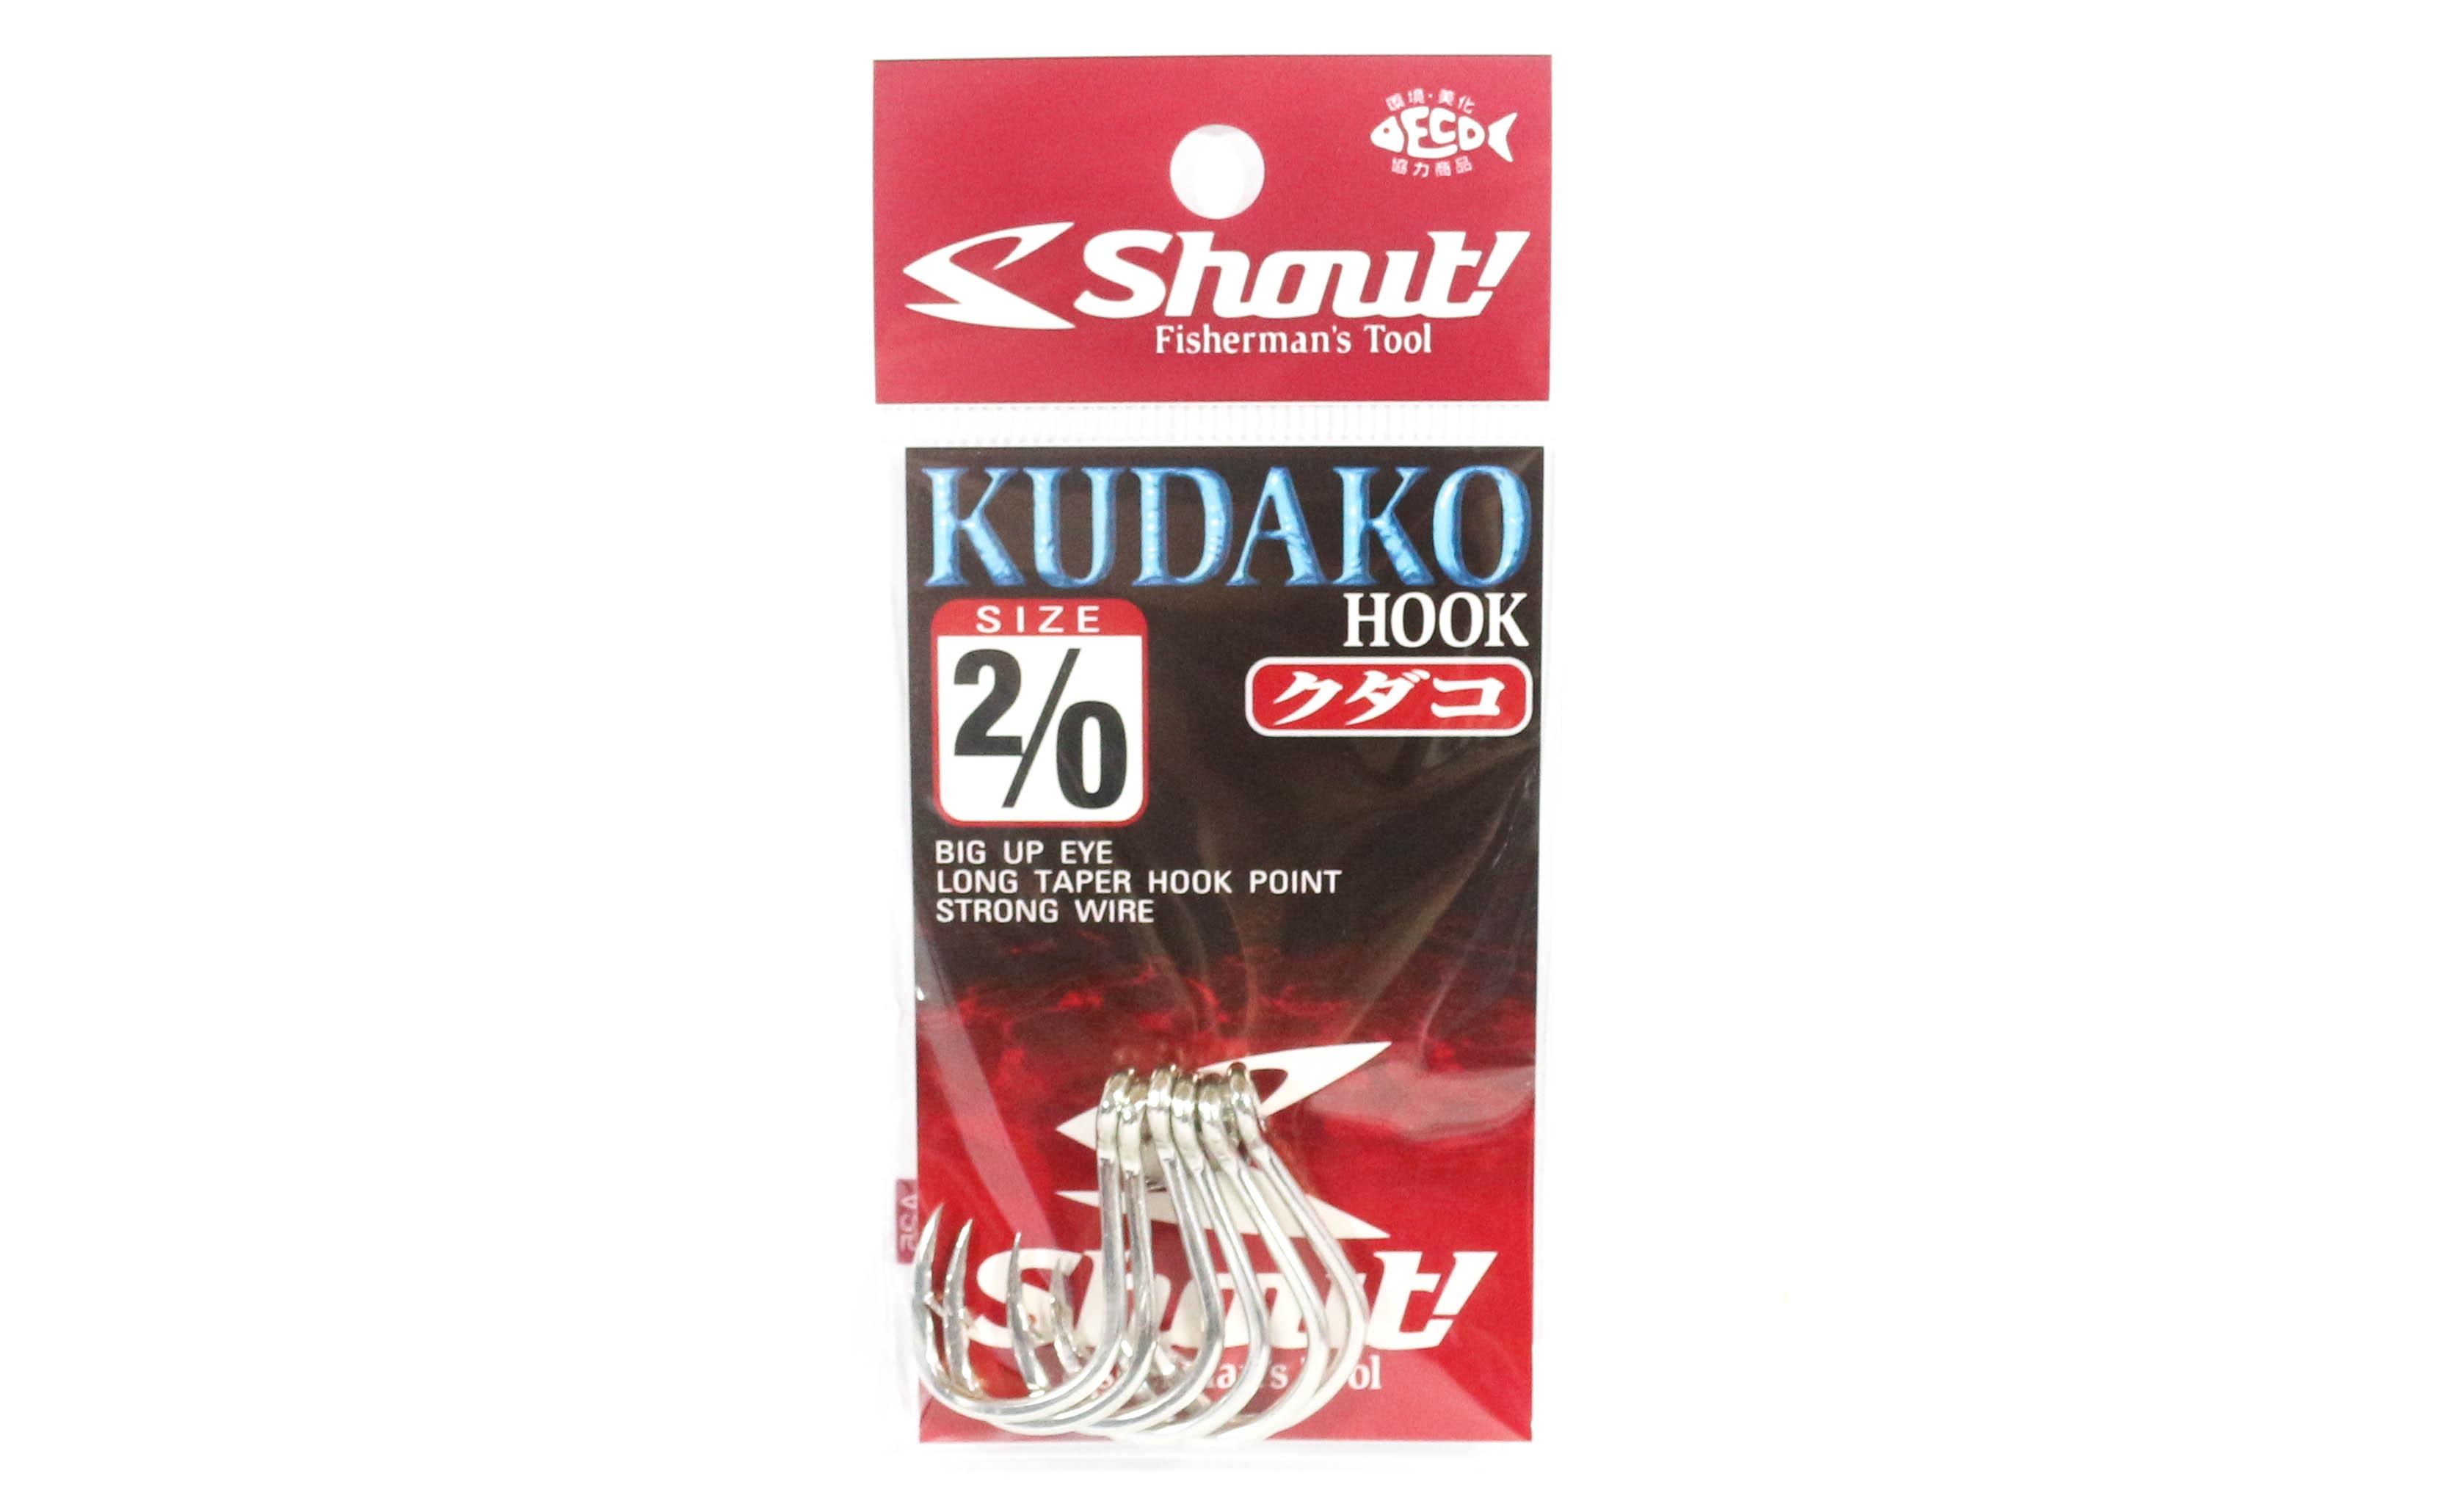 Shout 04-KH Kudako Power Jigging Single Hook Silver Size 2/0 (7208)